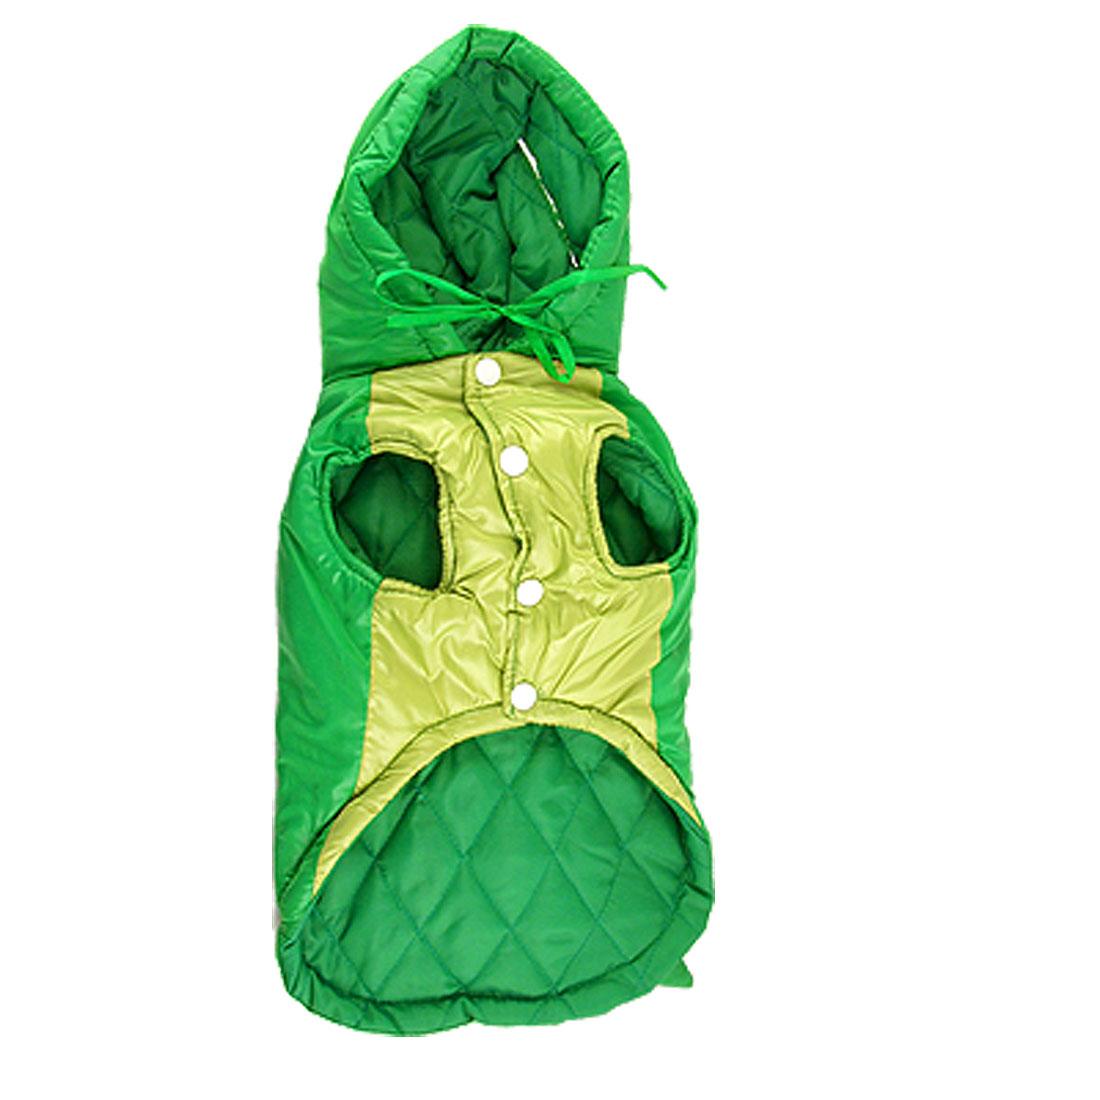 Size L Winter Green Dinosaur Design Pet Dog Clothes Hood Coat Dress Jumpsuit